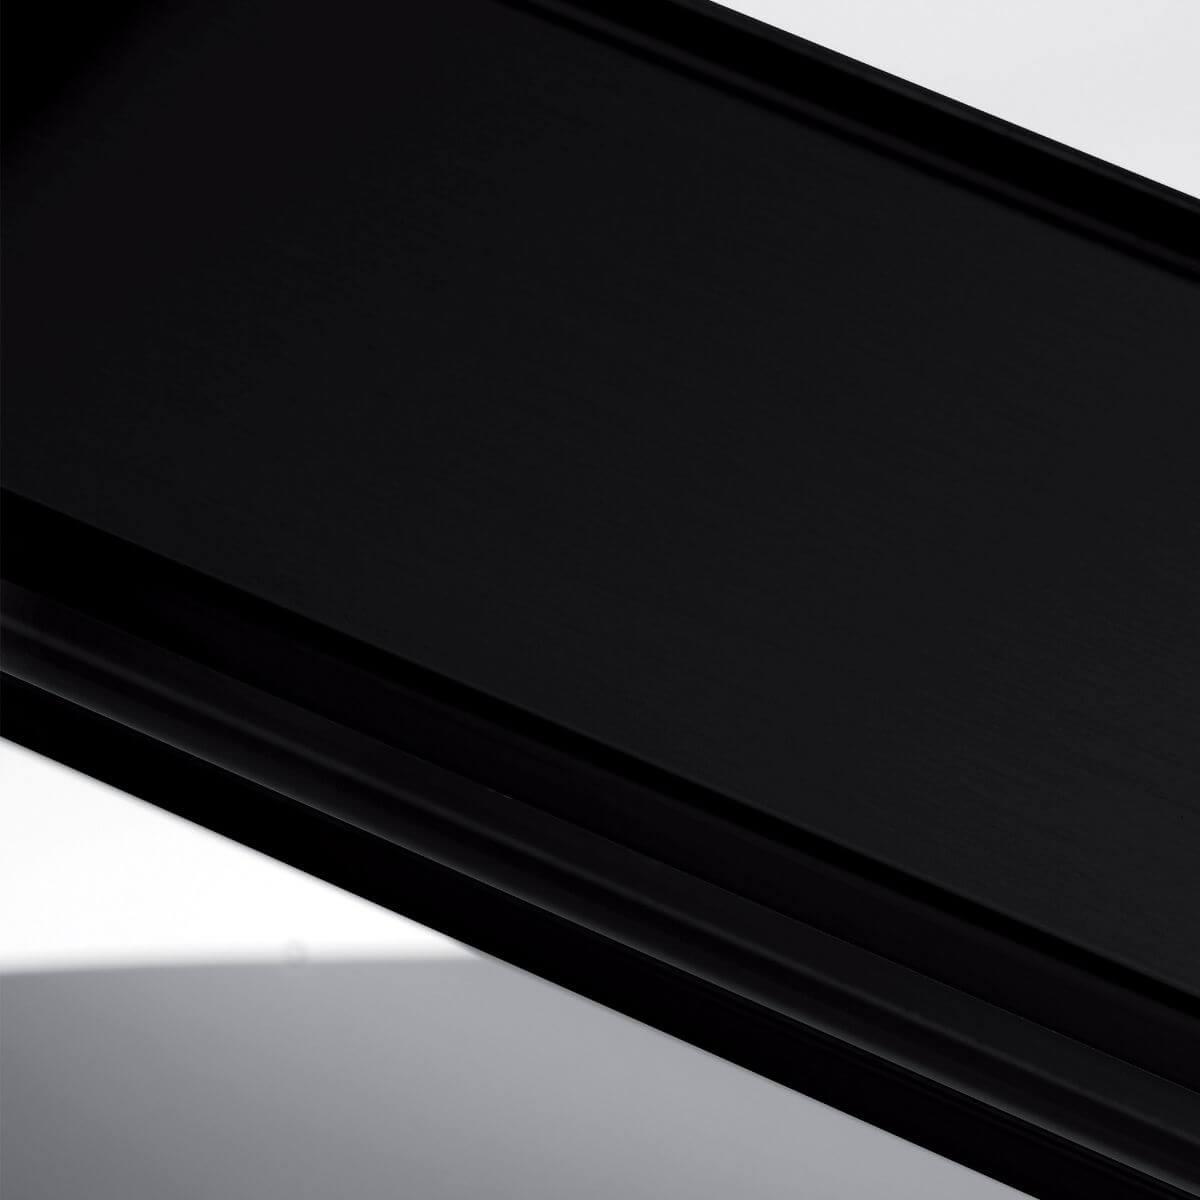 Finish aluminium black ral 9005 for glass wall